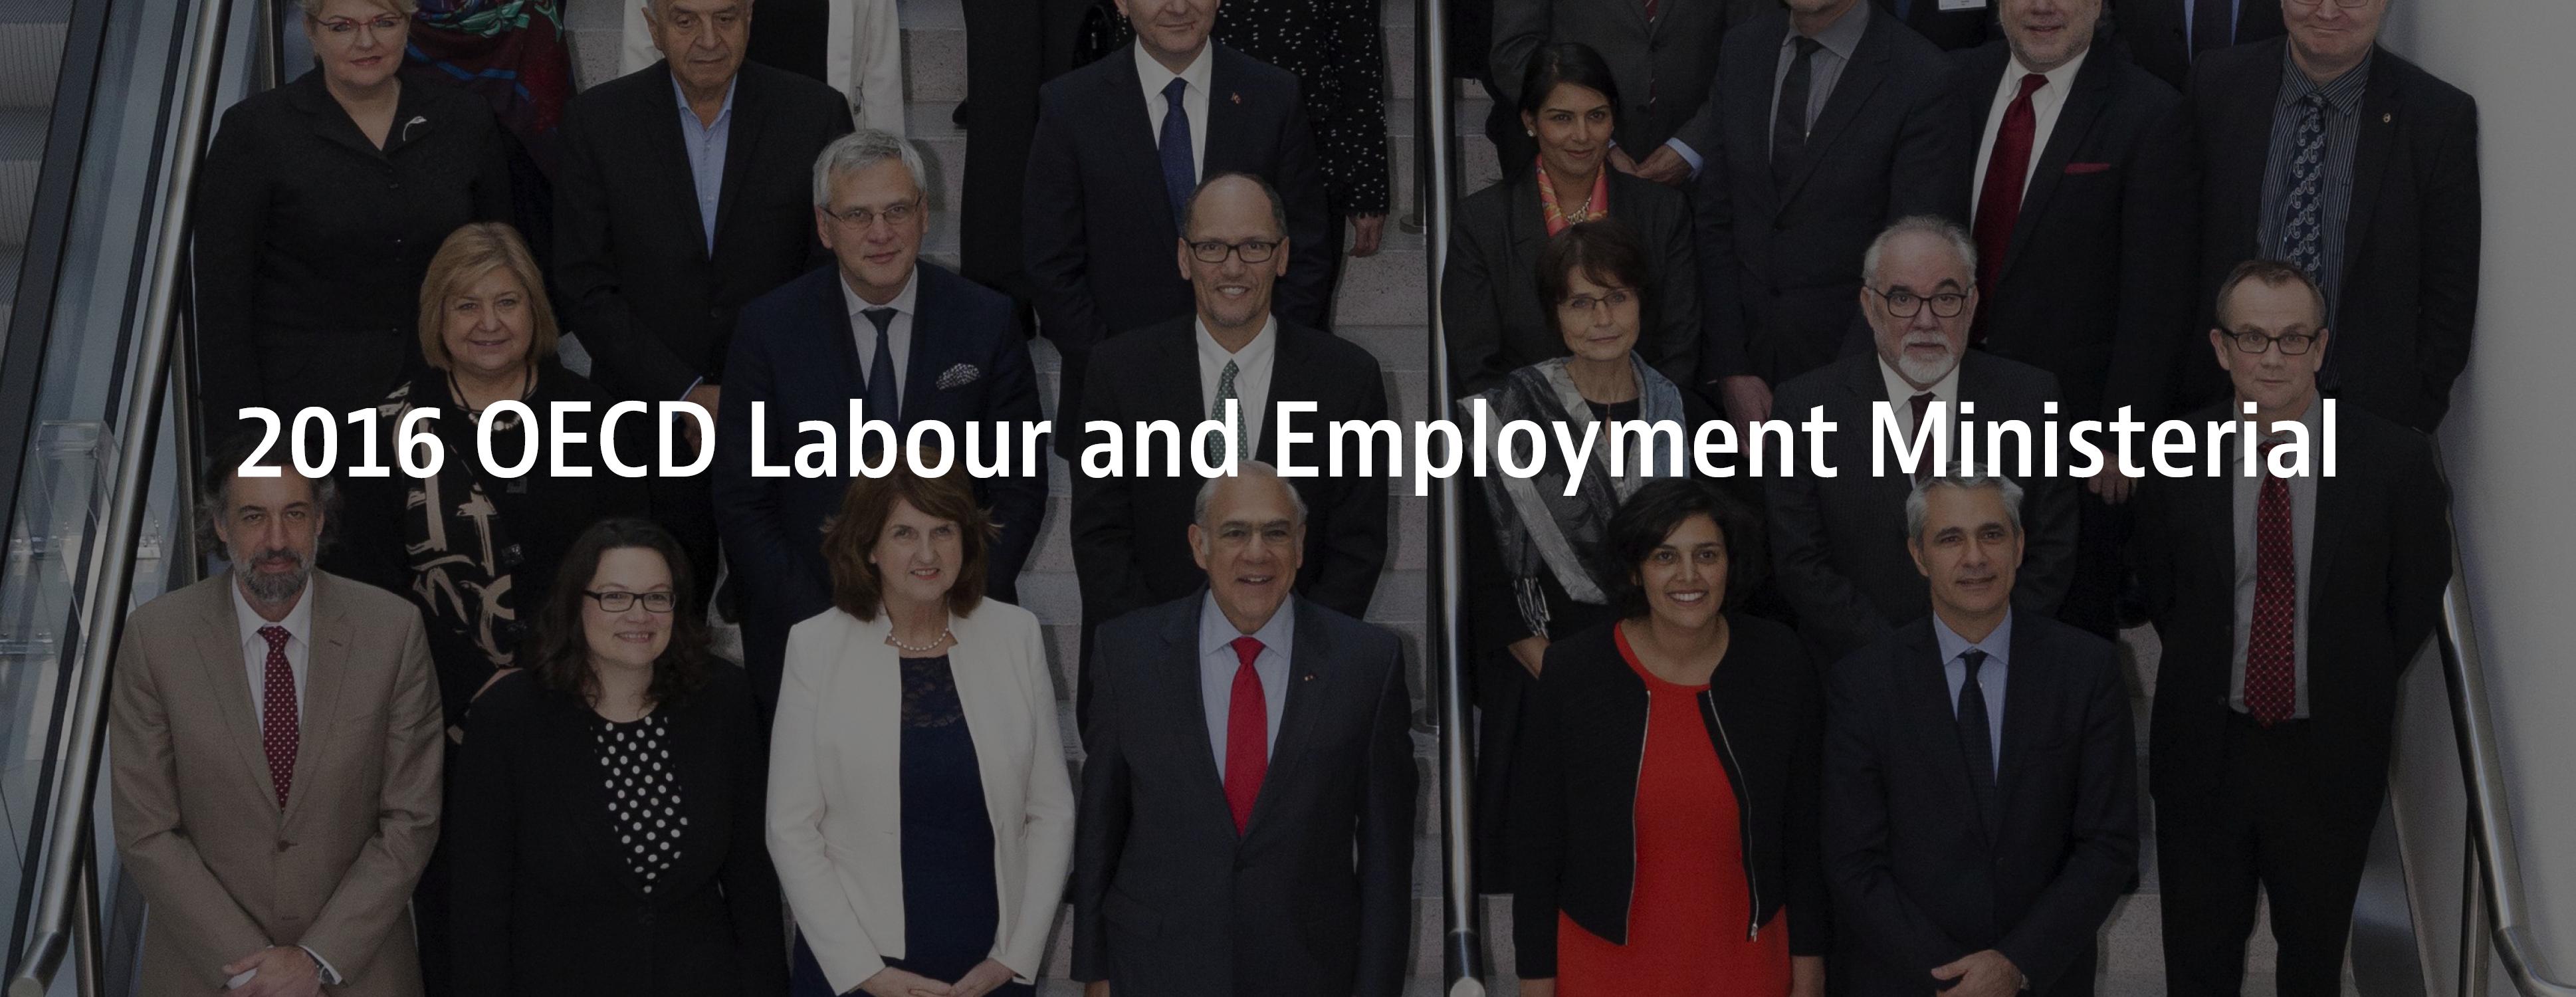 travail émirats arabes unis